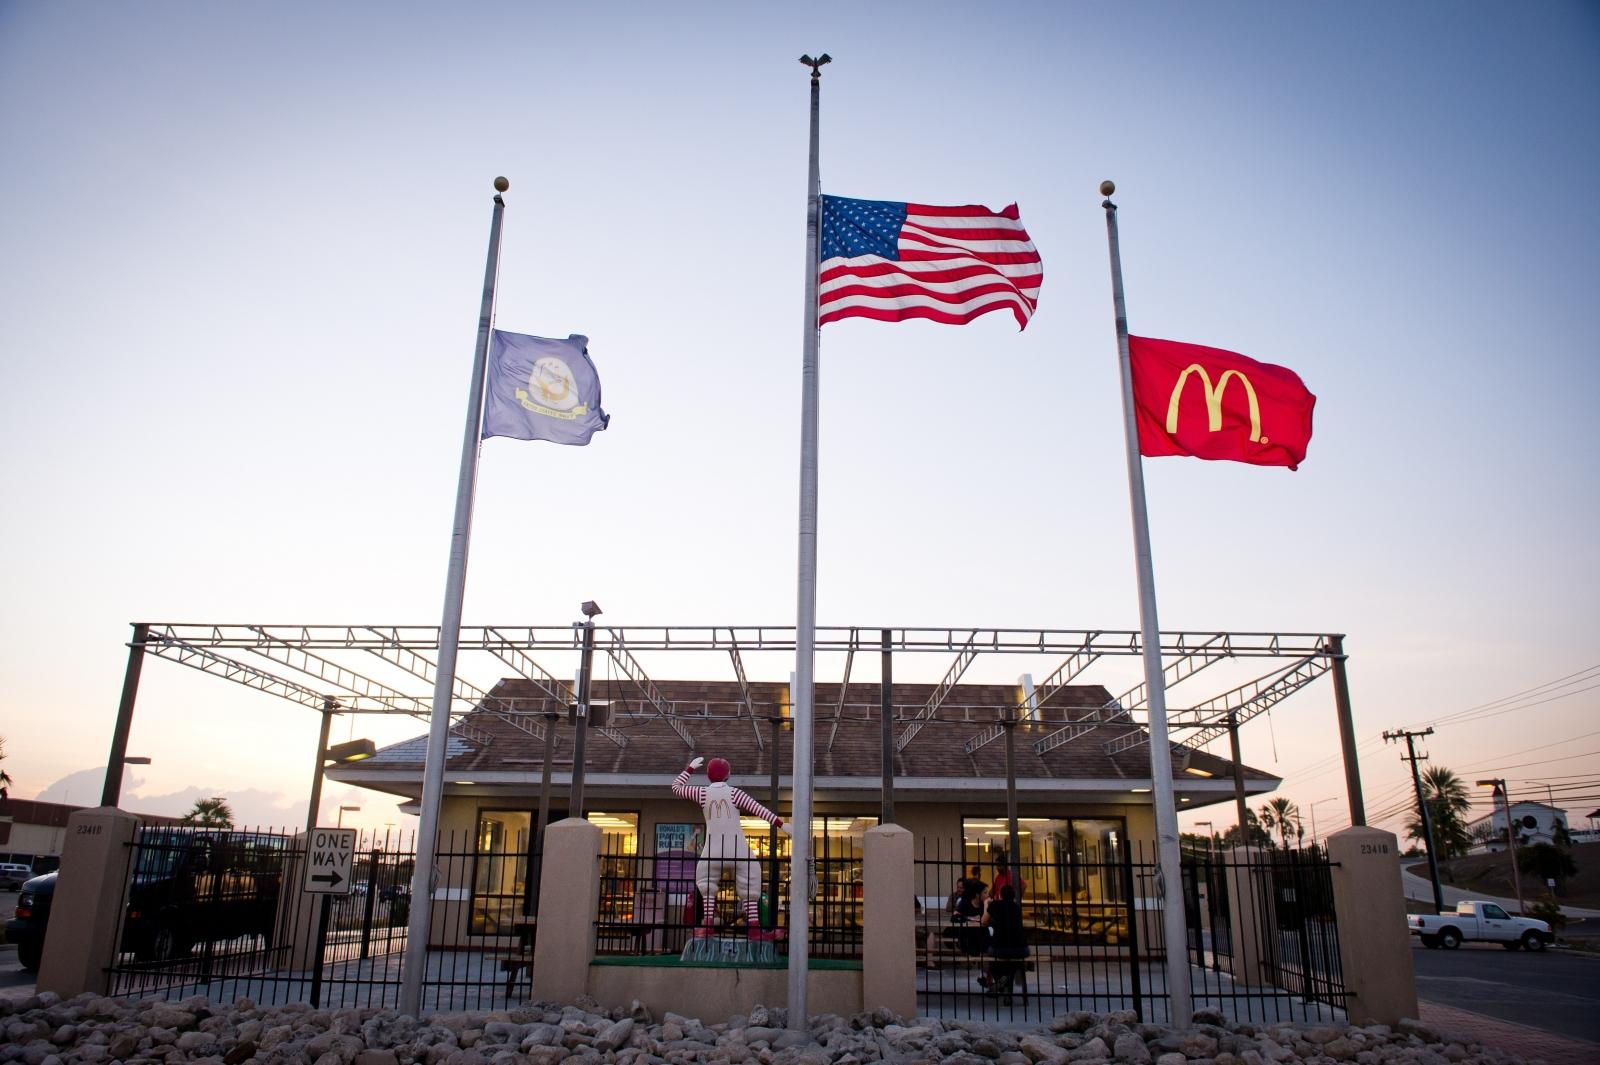 Guatanamo McDonalds